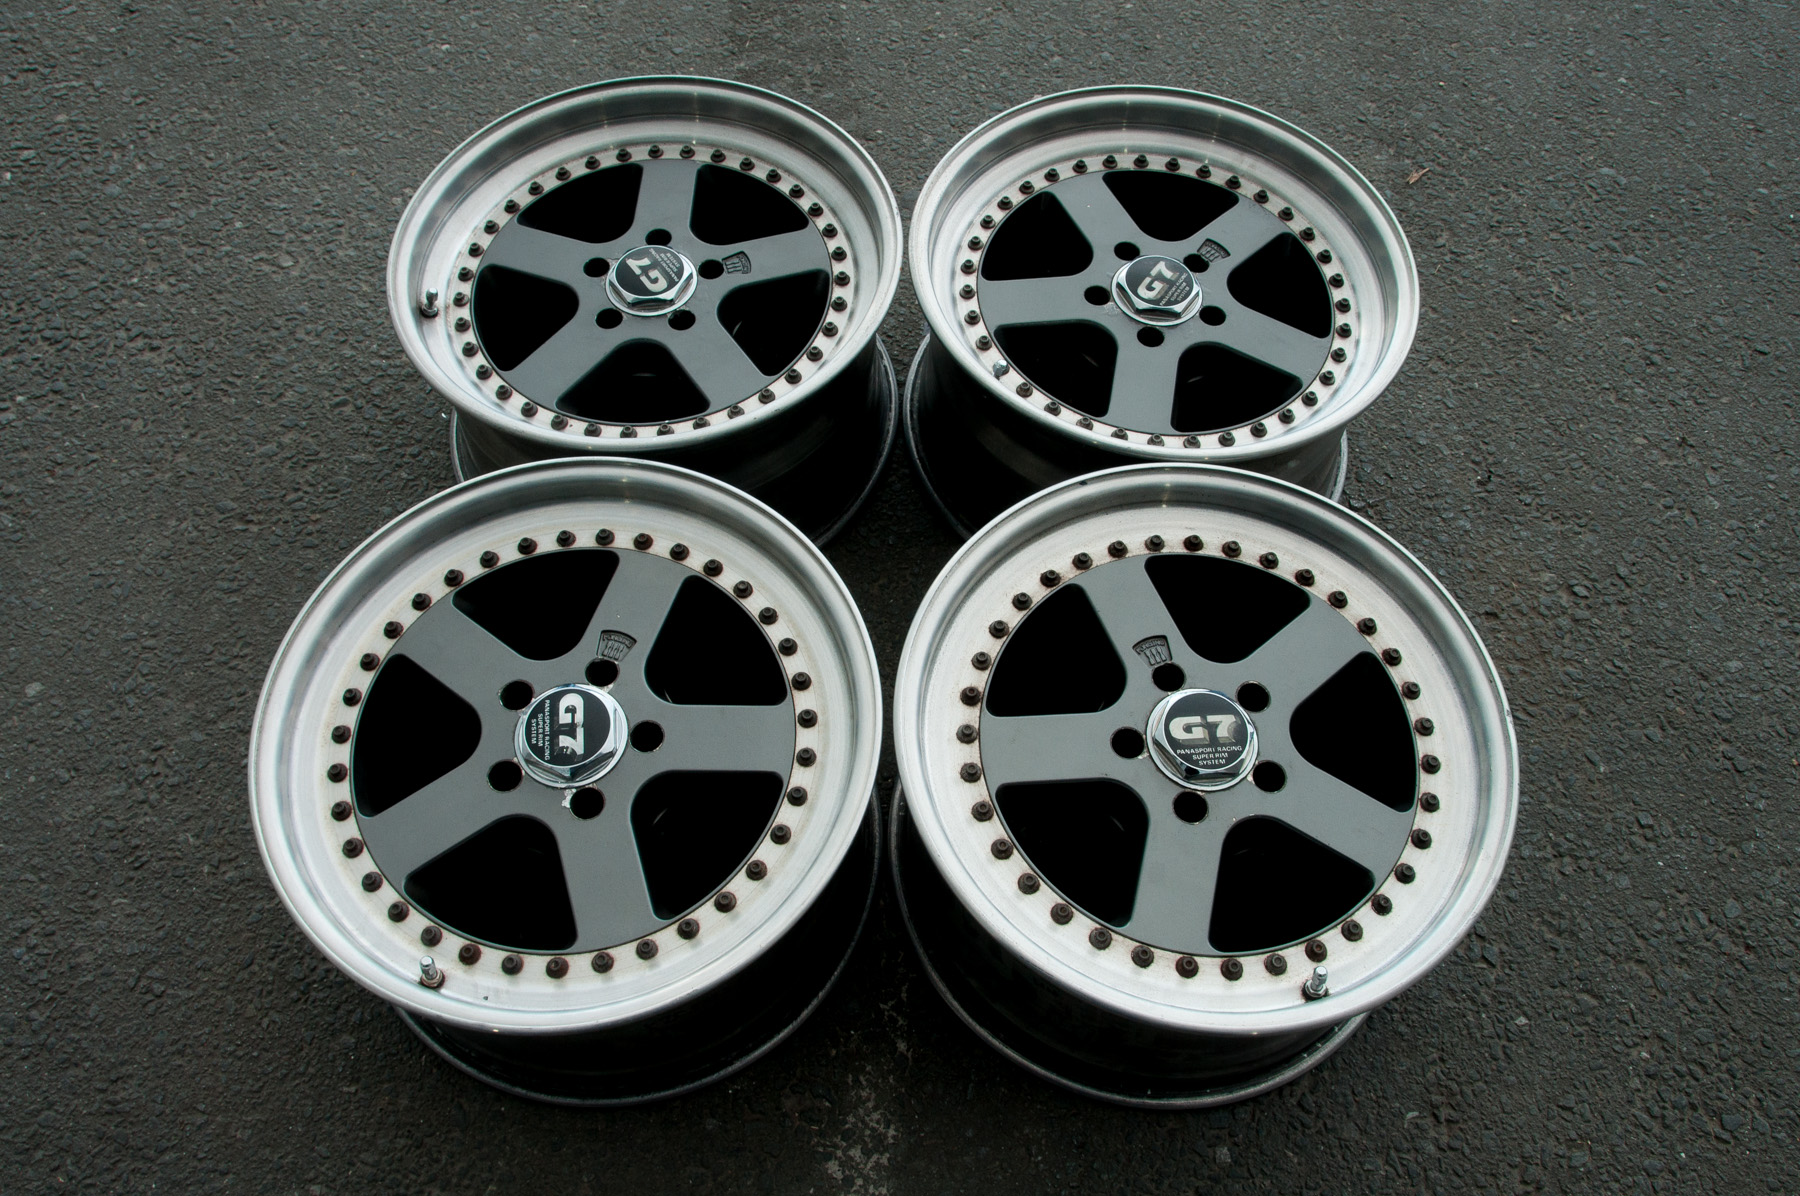 Panasport G7 C5c Jdmdistro Buy Jdm Parts Online